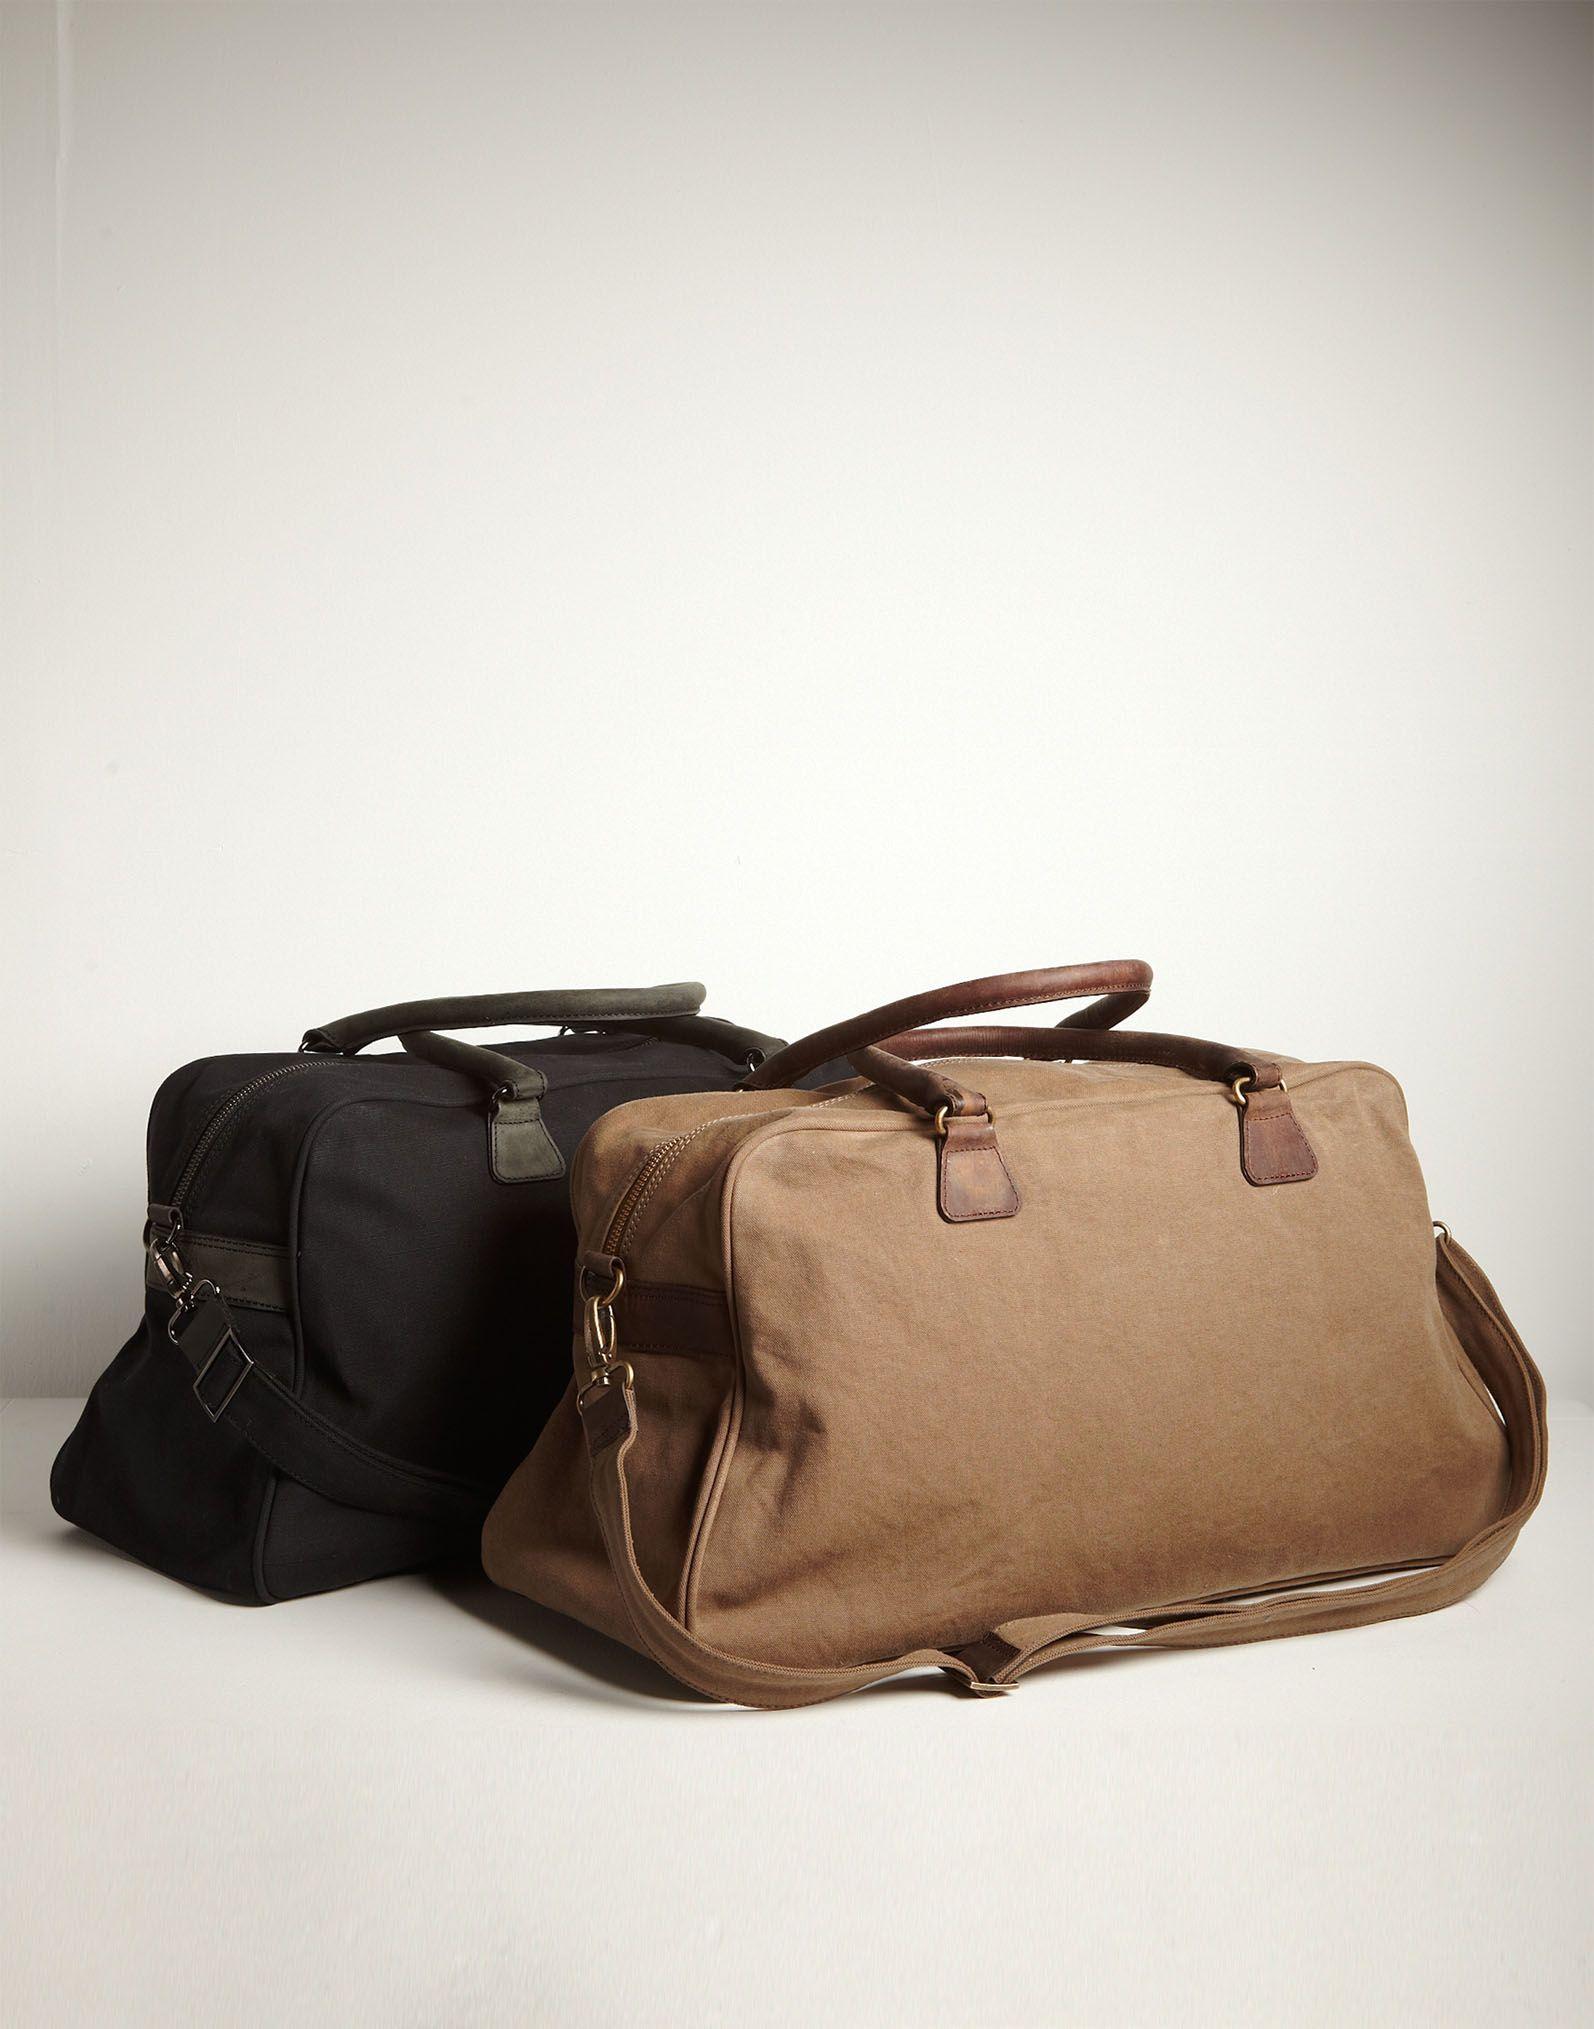 Dunderdon Canvas Weekender Bag (€79.95)